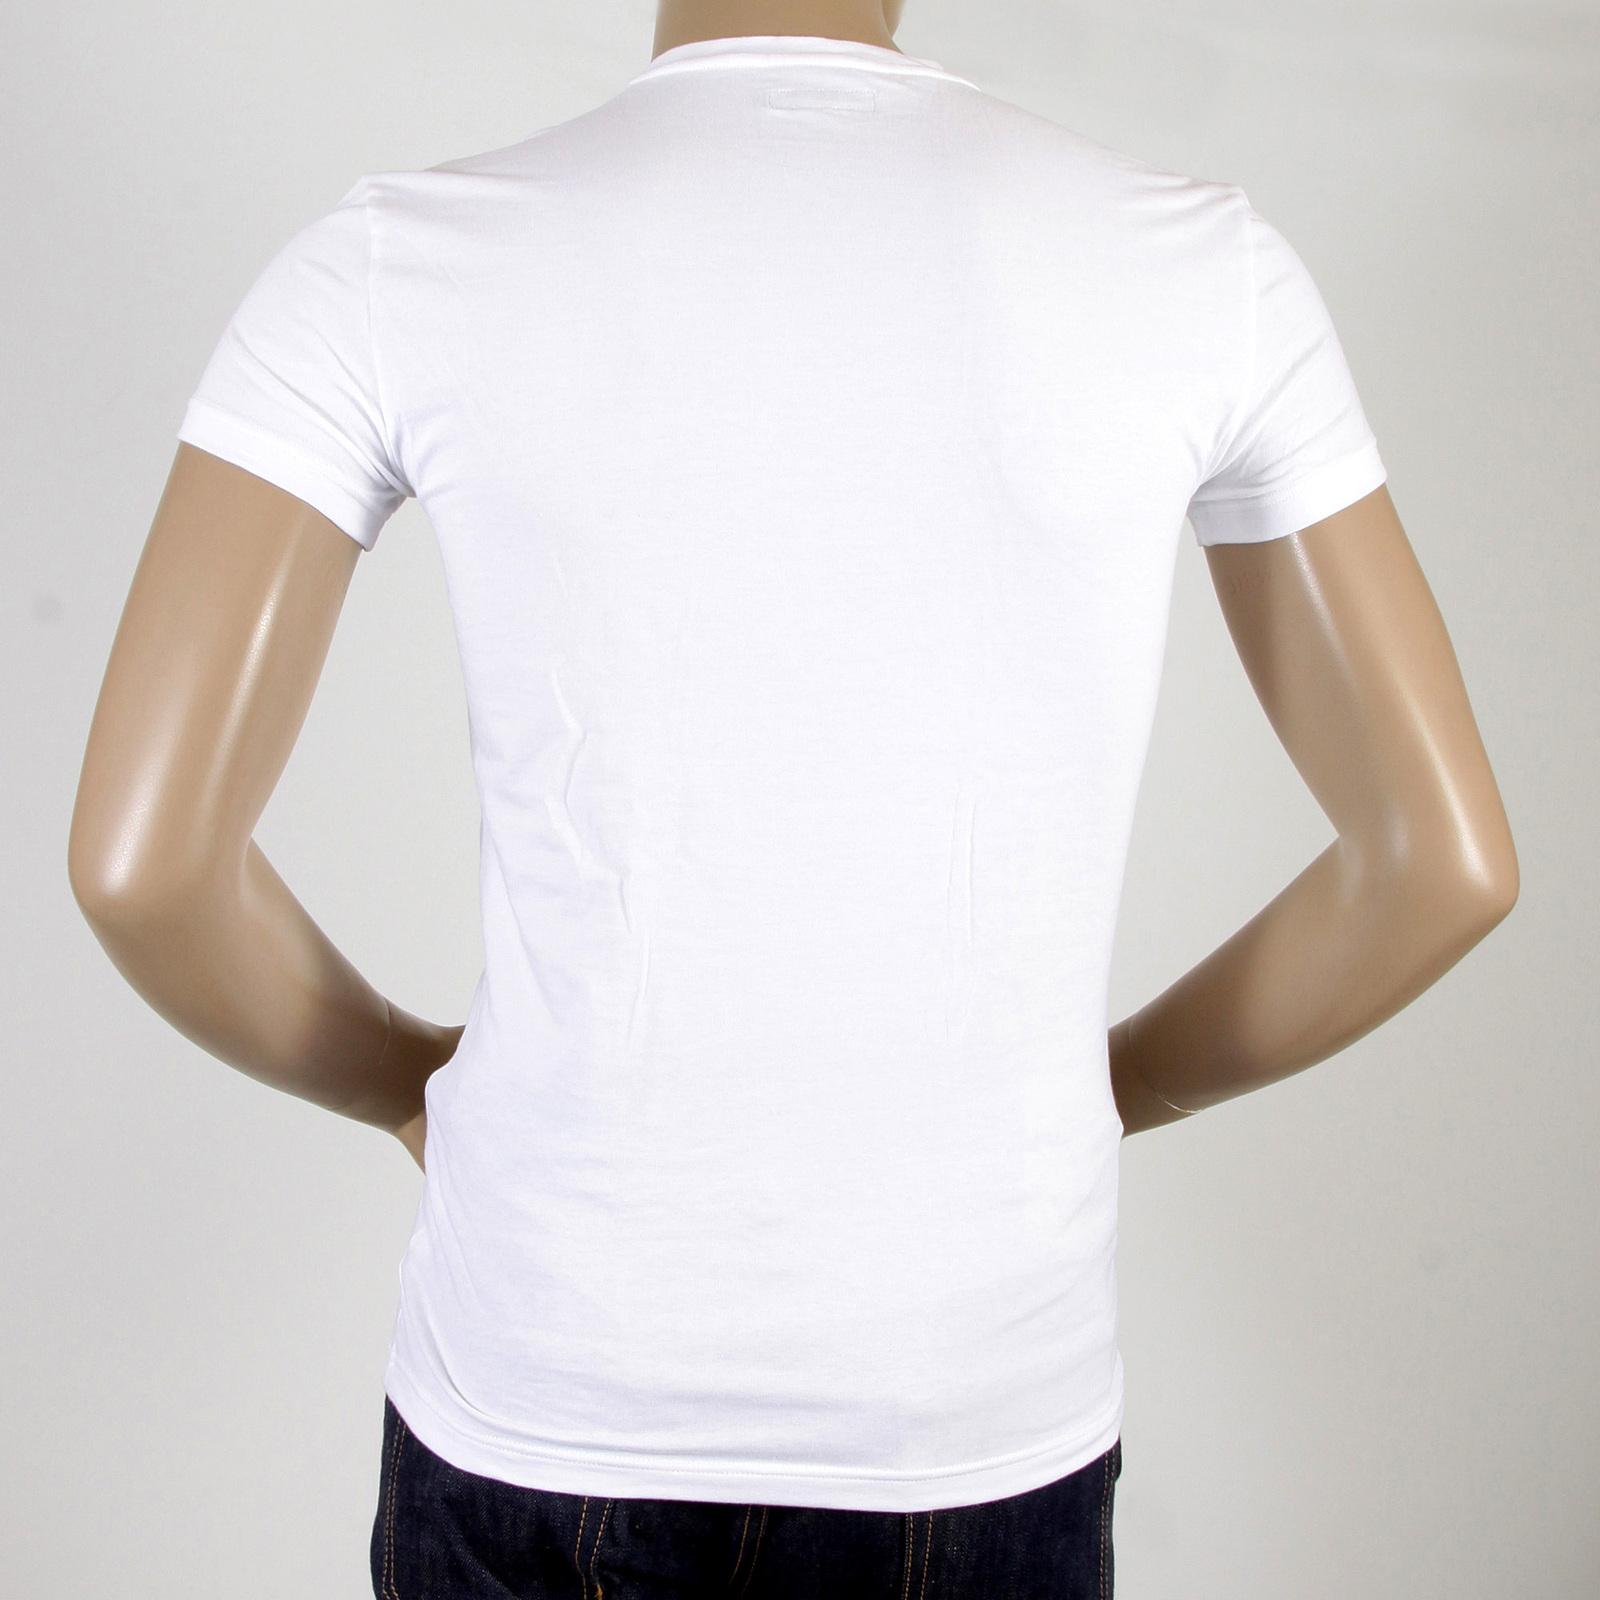 4a846af9ac5bd Emporio Armani t shirts white V neck t shirt 110752 CC518 EAM2386 at ...